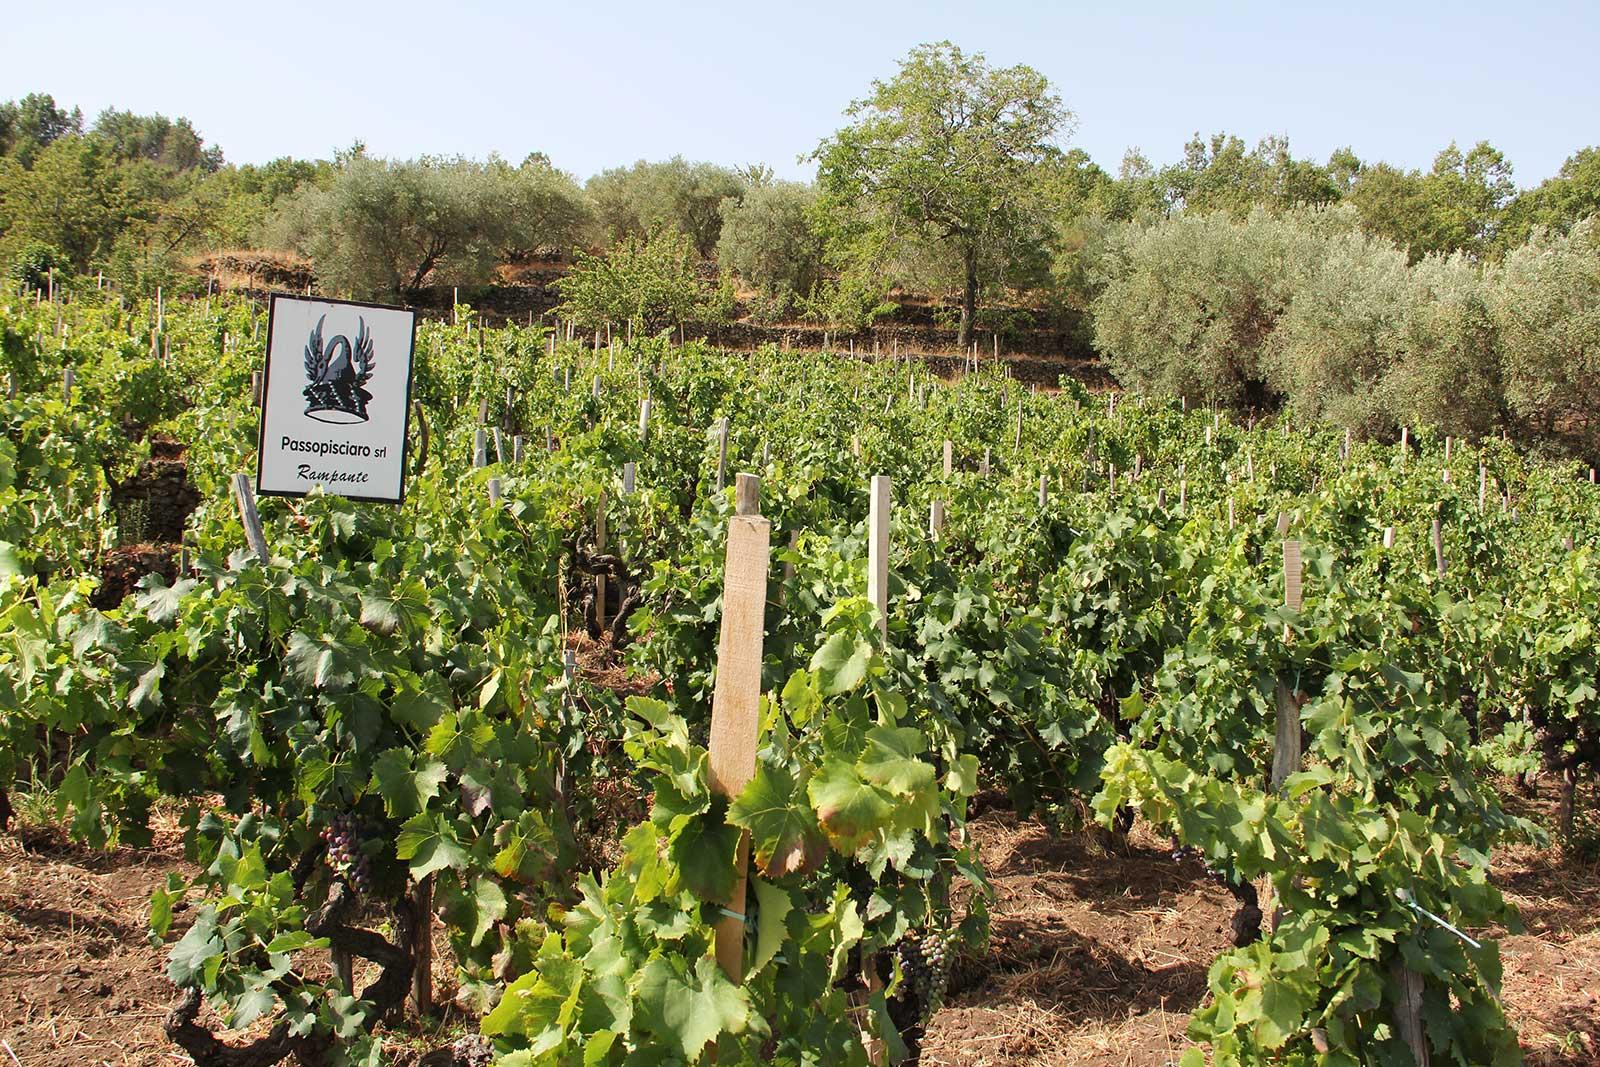 Passopisciaro's vineyard at Contrada Rampante on the upper slopes of Mount Etna. ©Passopisciaro